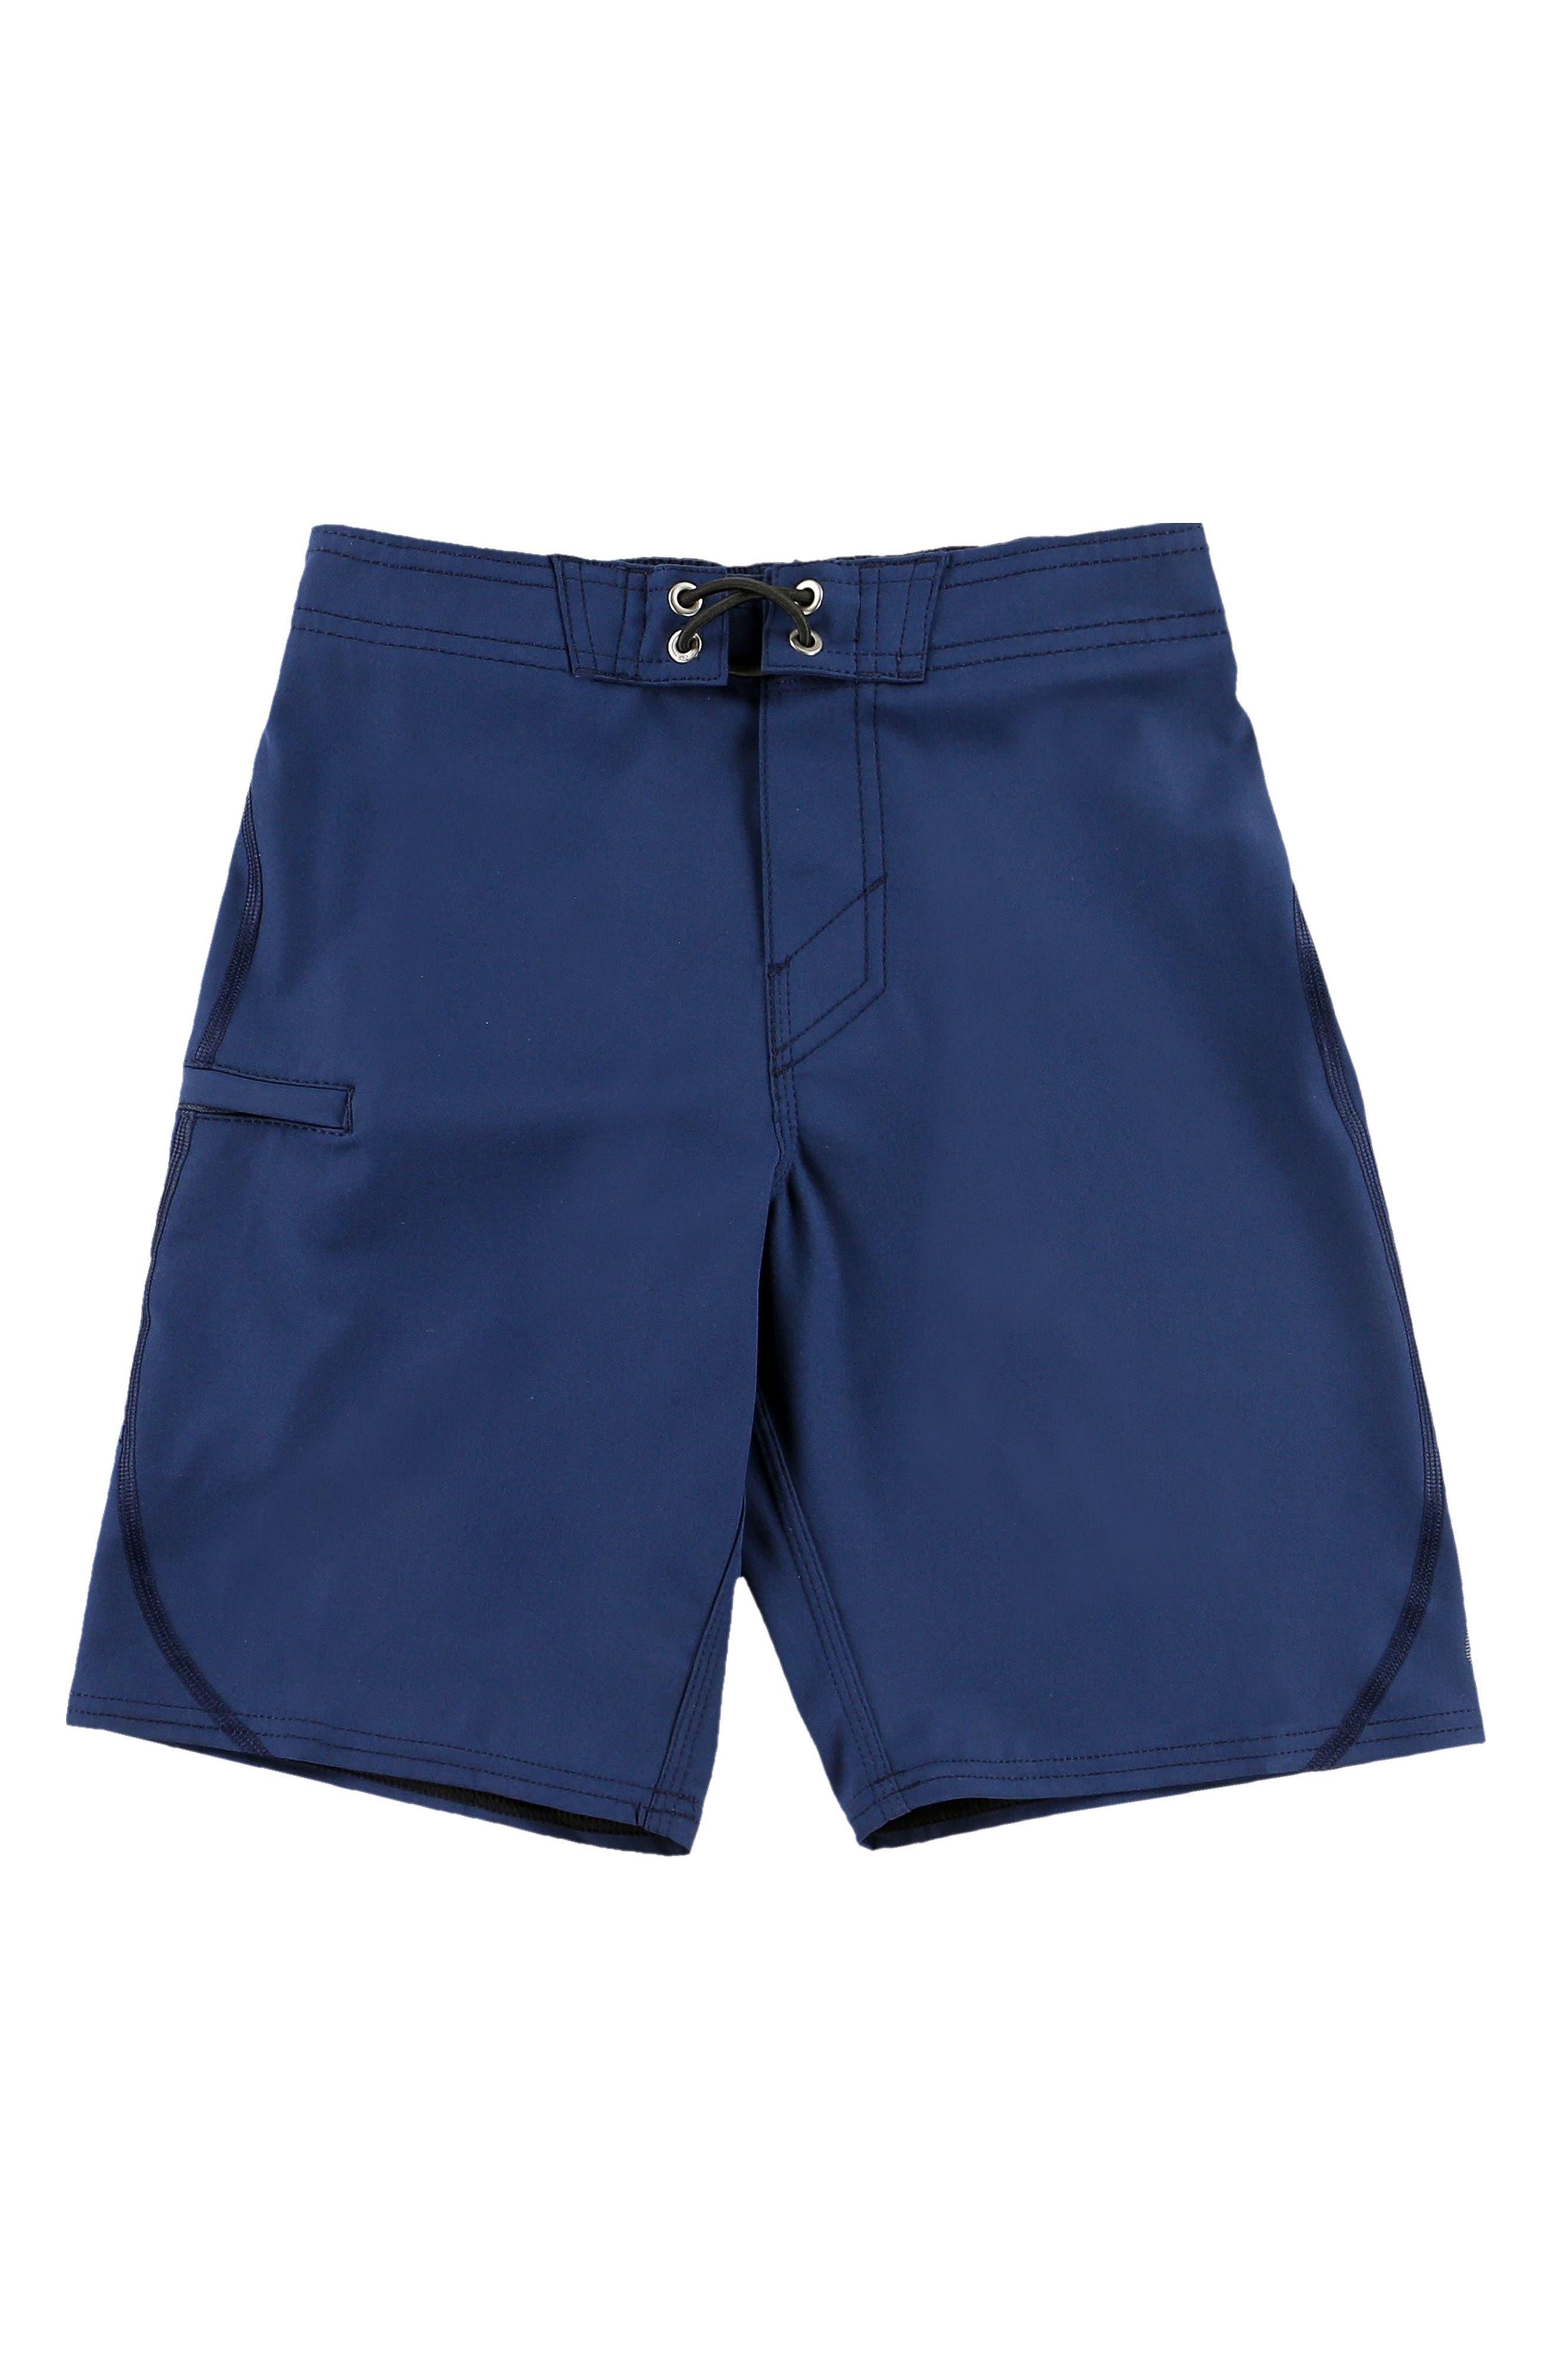 Hyperfreak S-Seam Stretch Board Shorts,                             Main thumbnail 2, color,